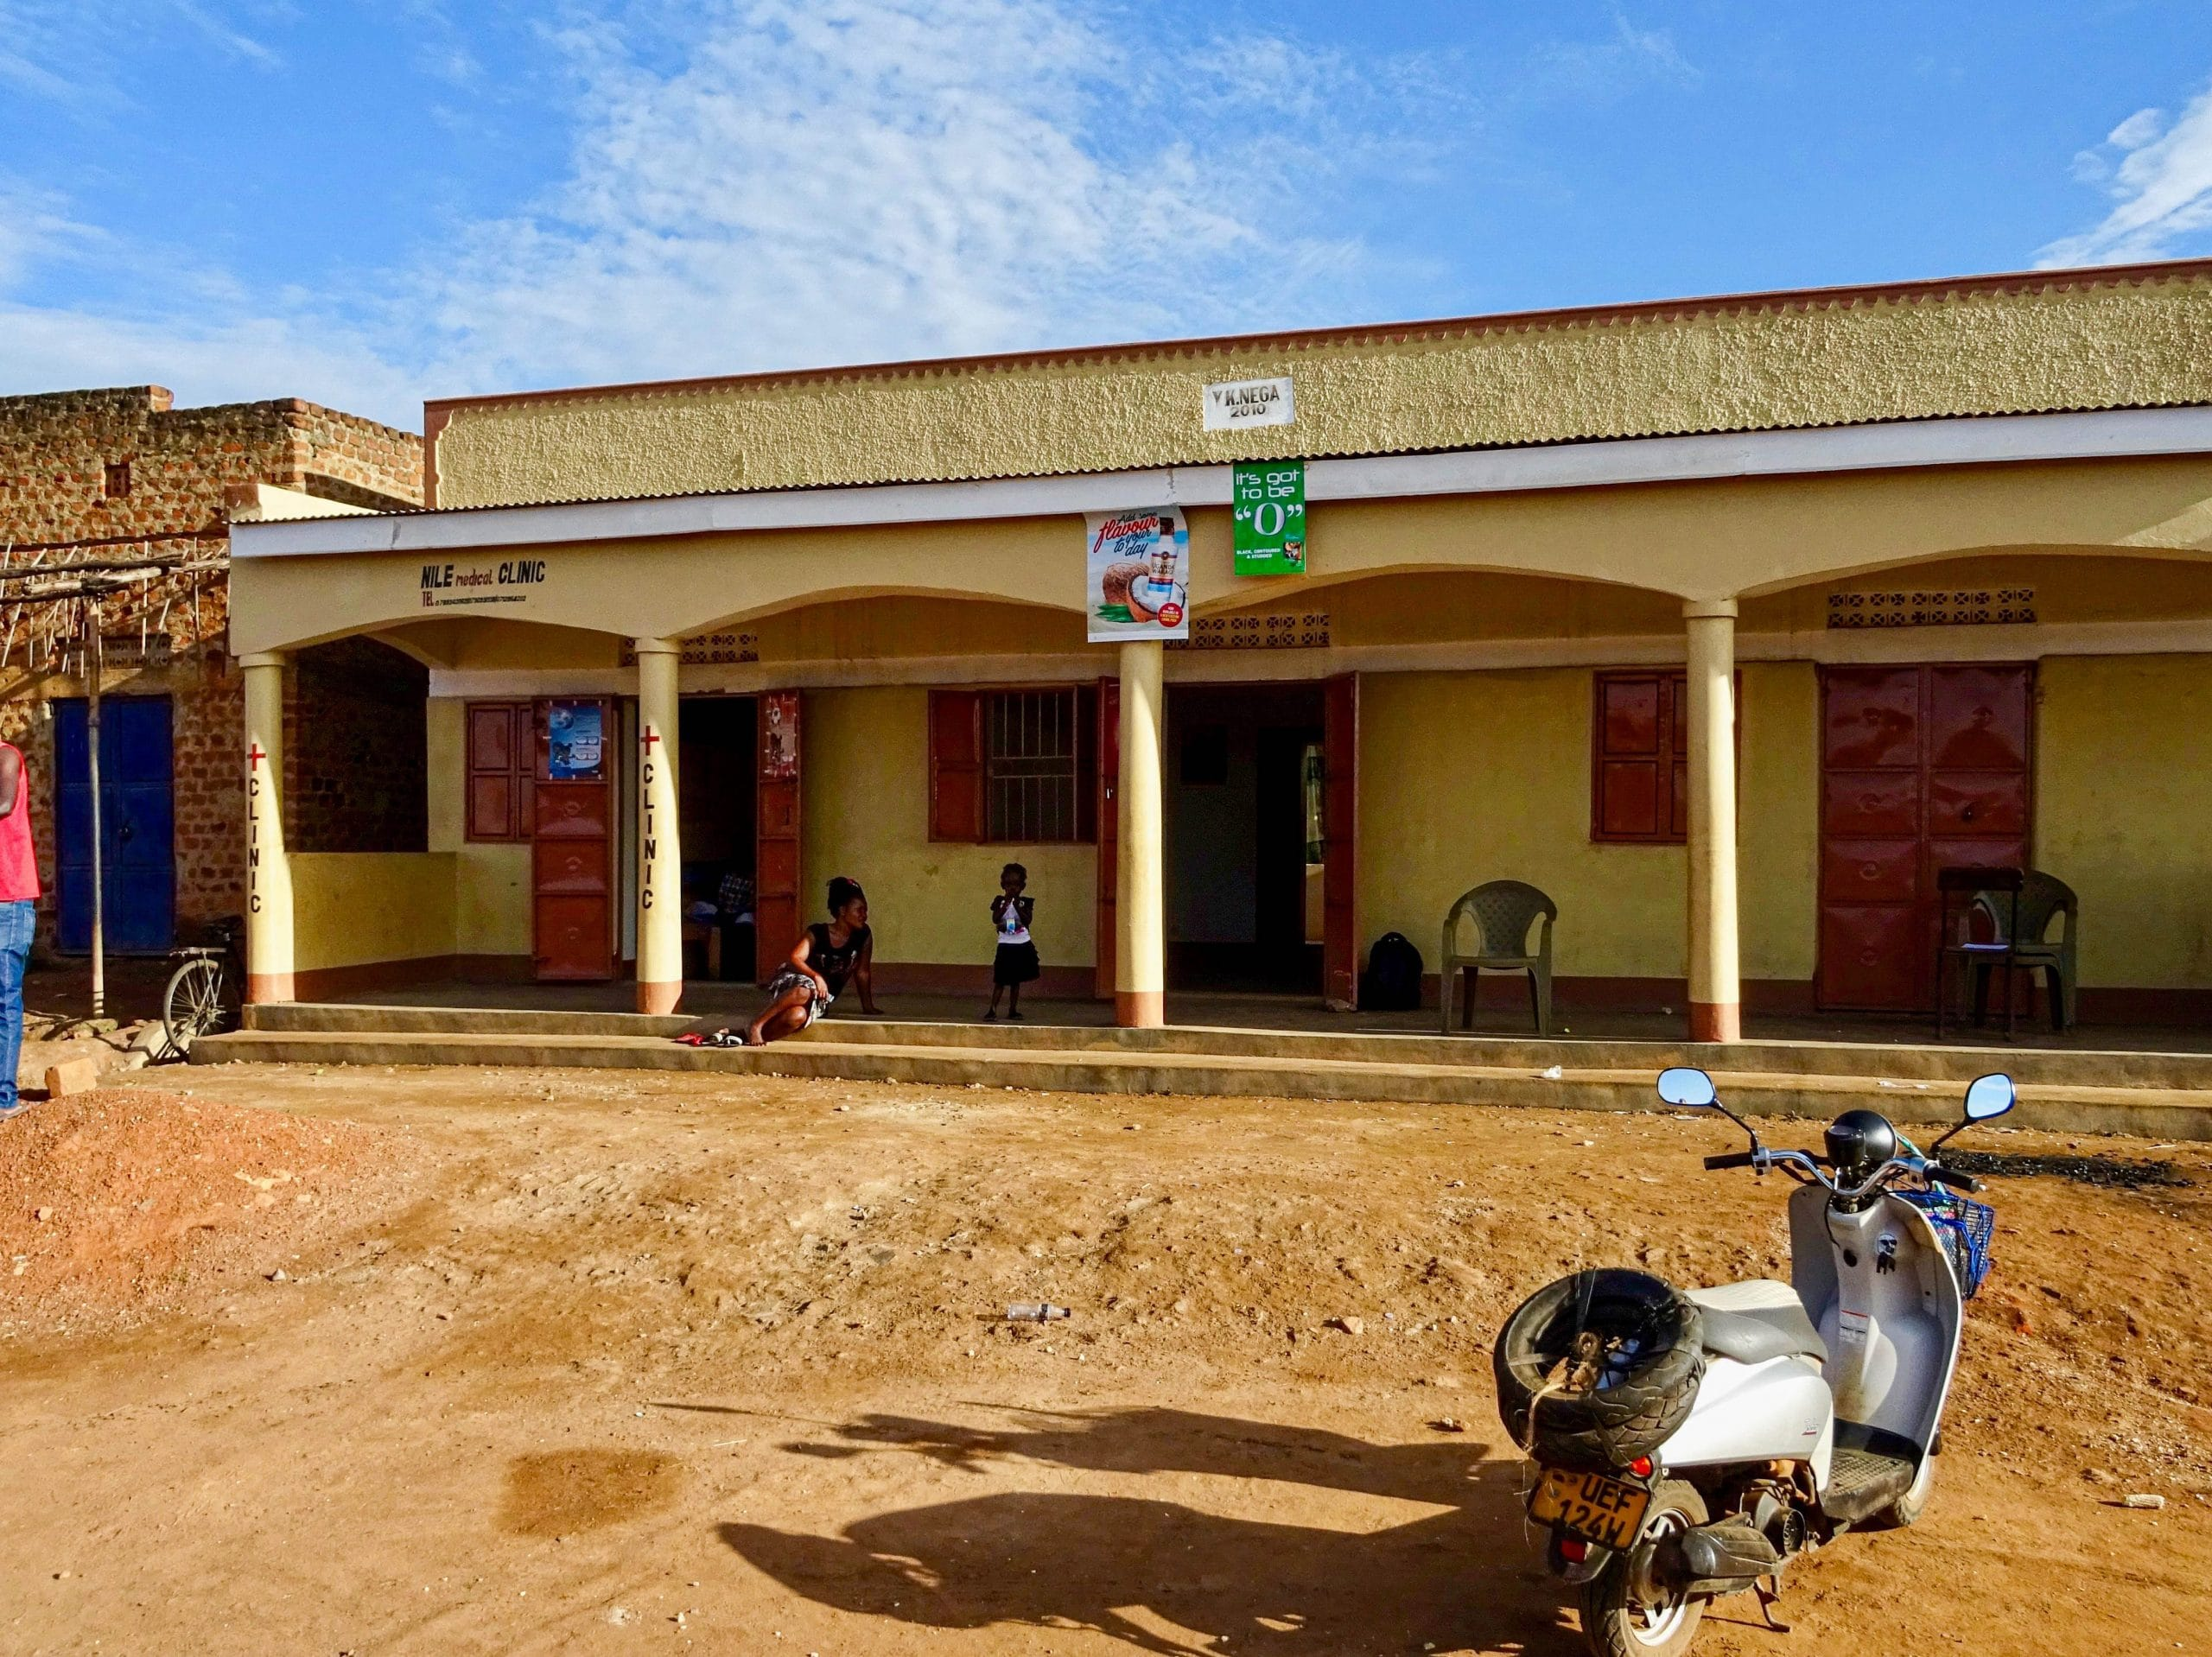 Nile Medical Clinic en het guesthouse in Purongo